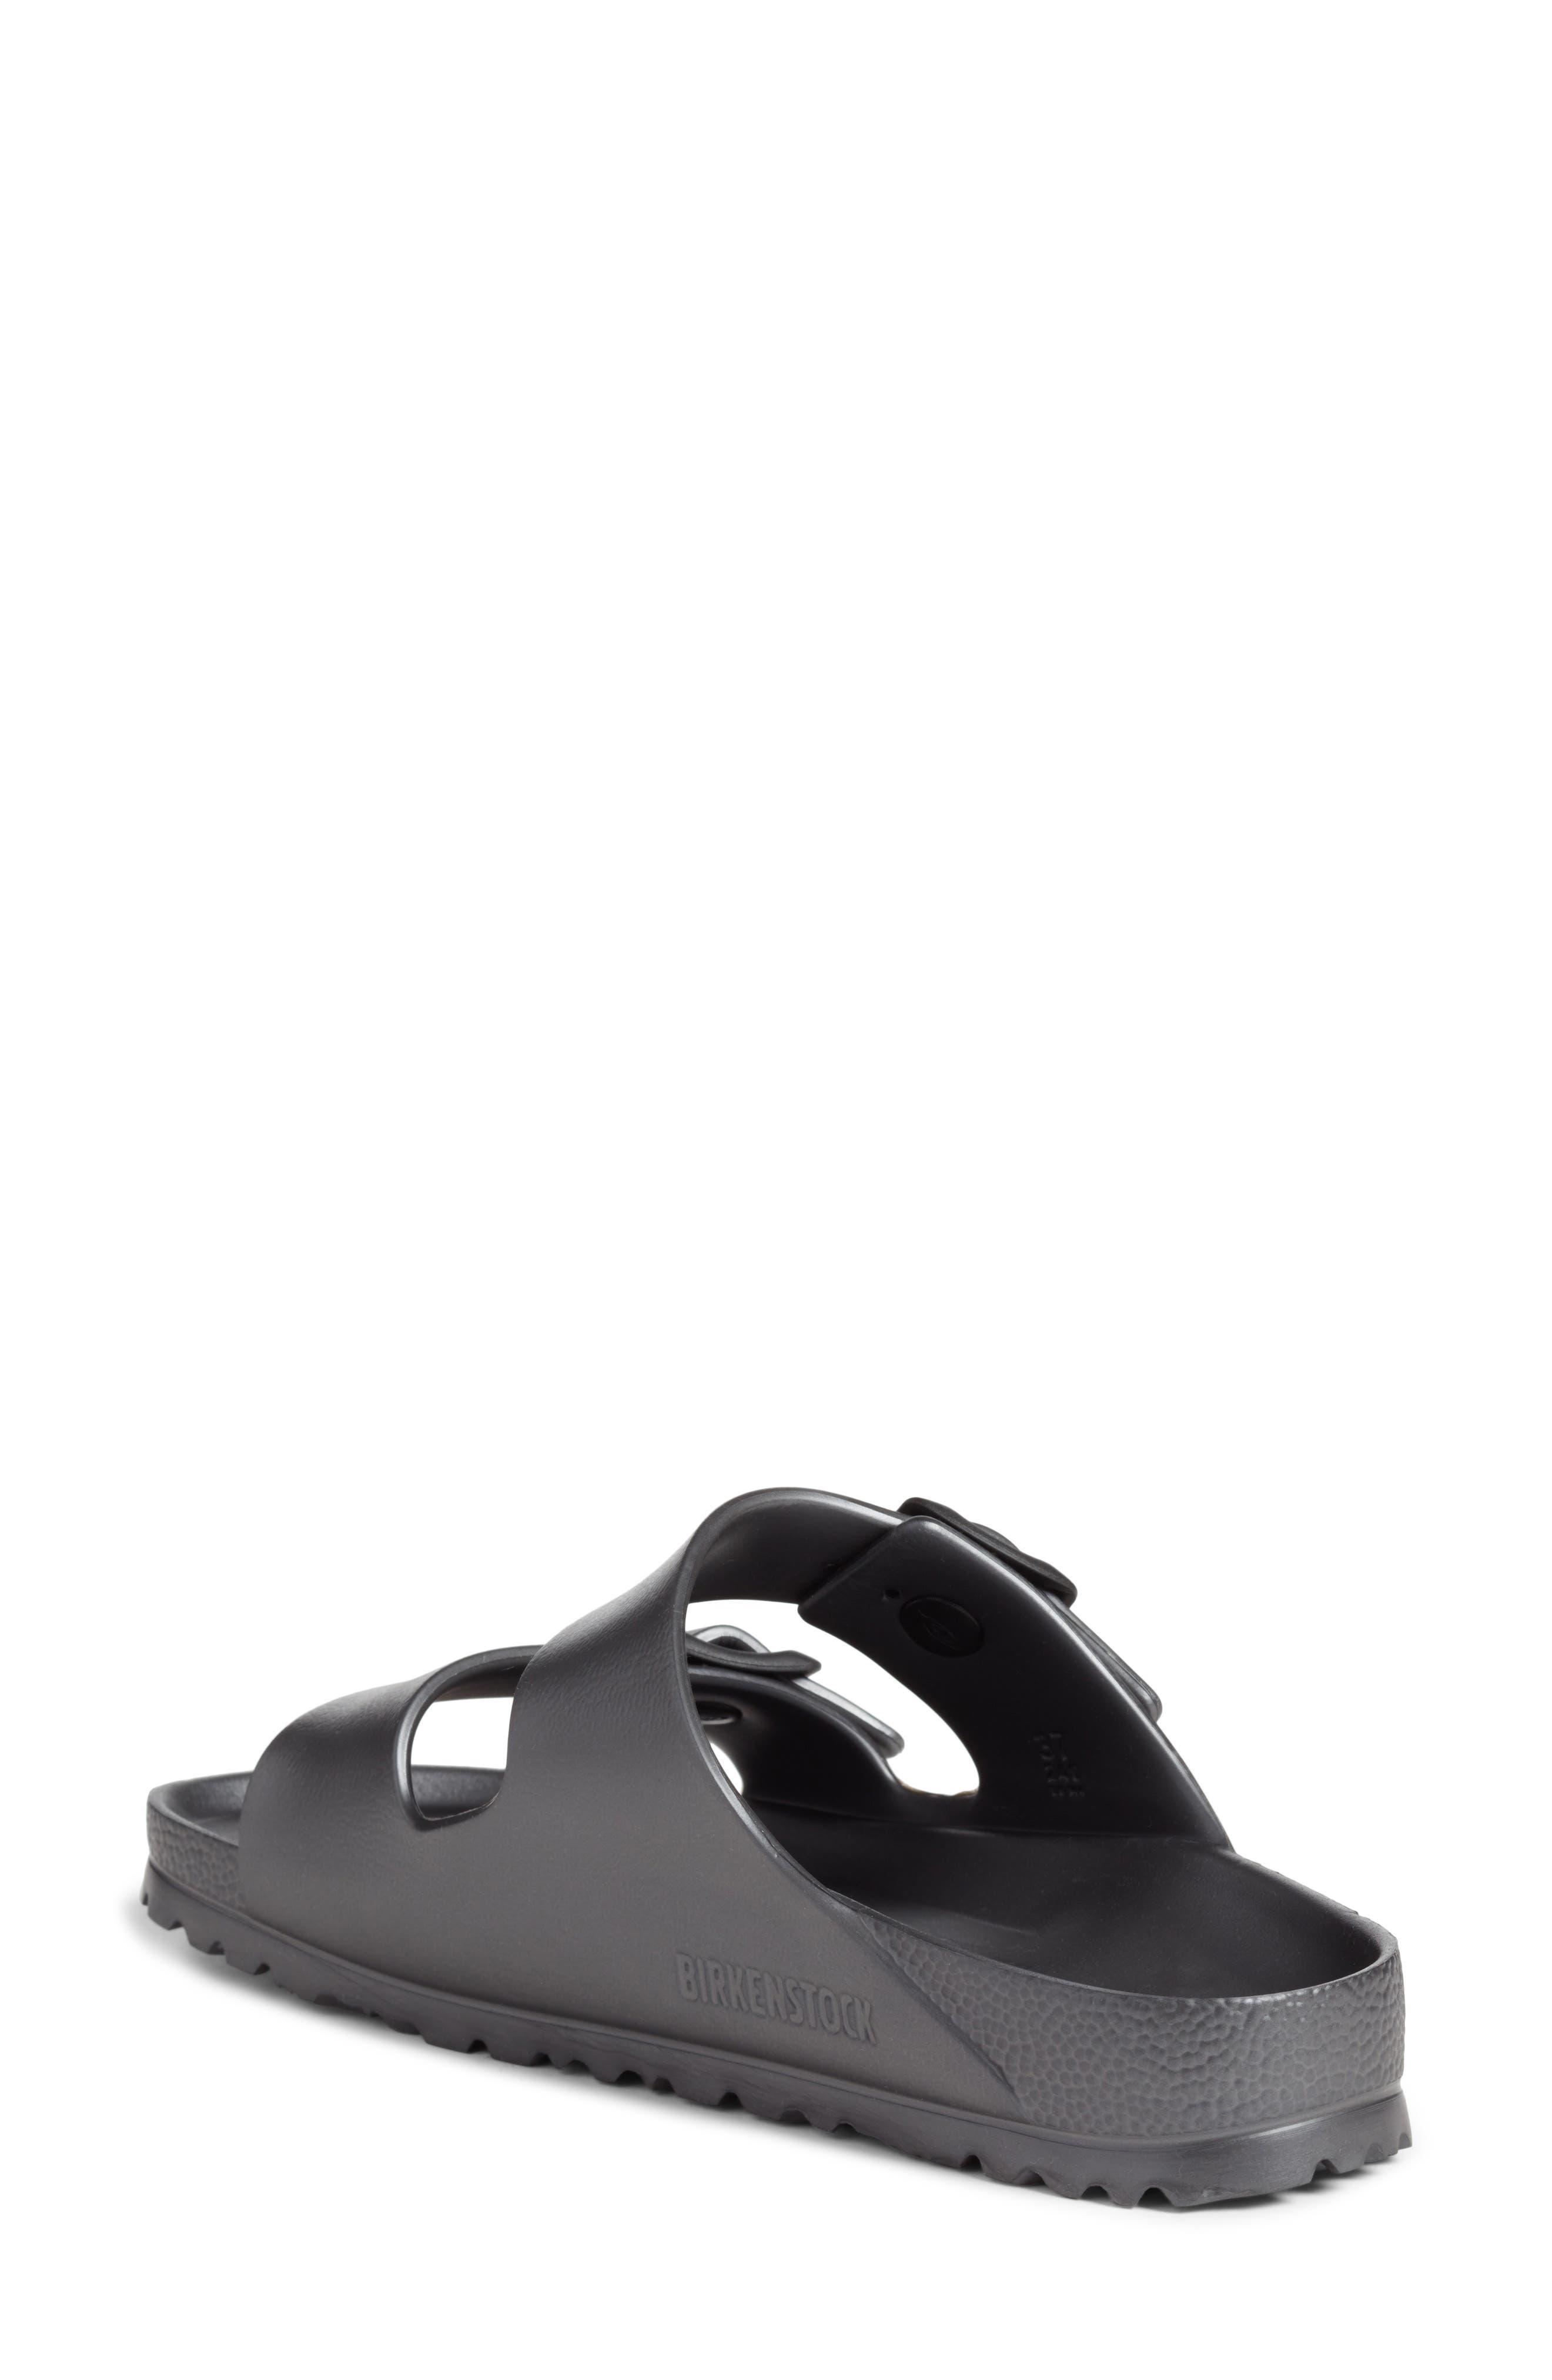 Essentials - Arizona Slide Sandal,                             Alternate thumbnail 2, color,                             Metallic Anthracite